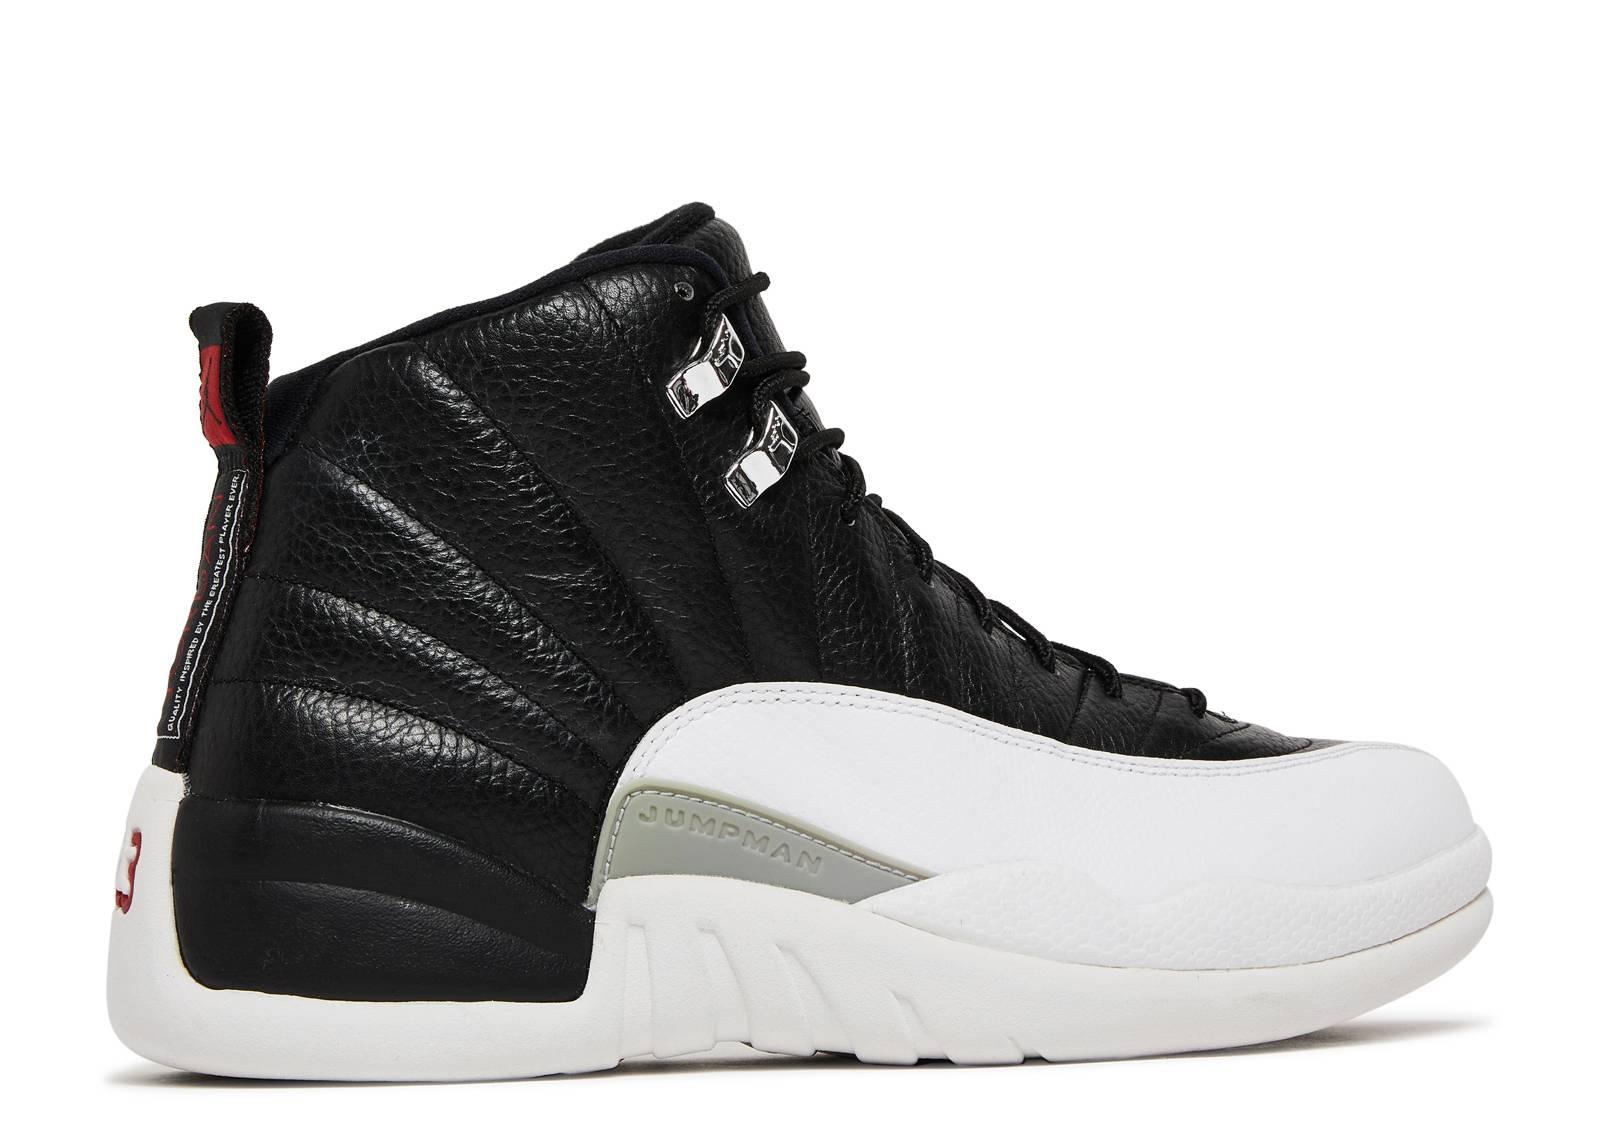 f070ba4bbe1a Air Jordan 12 Retro